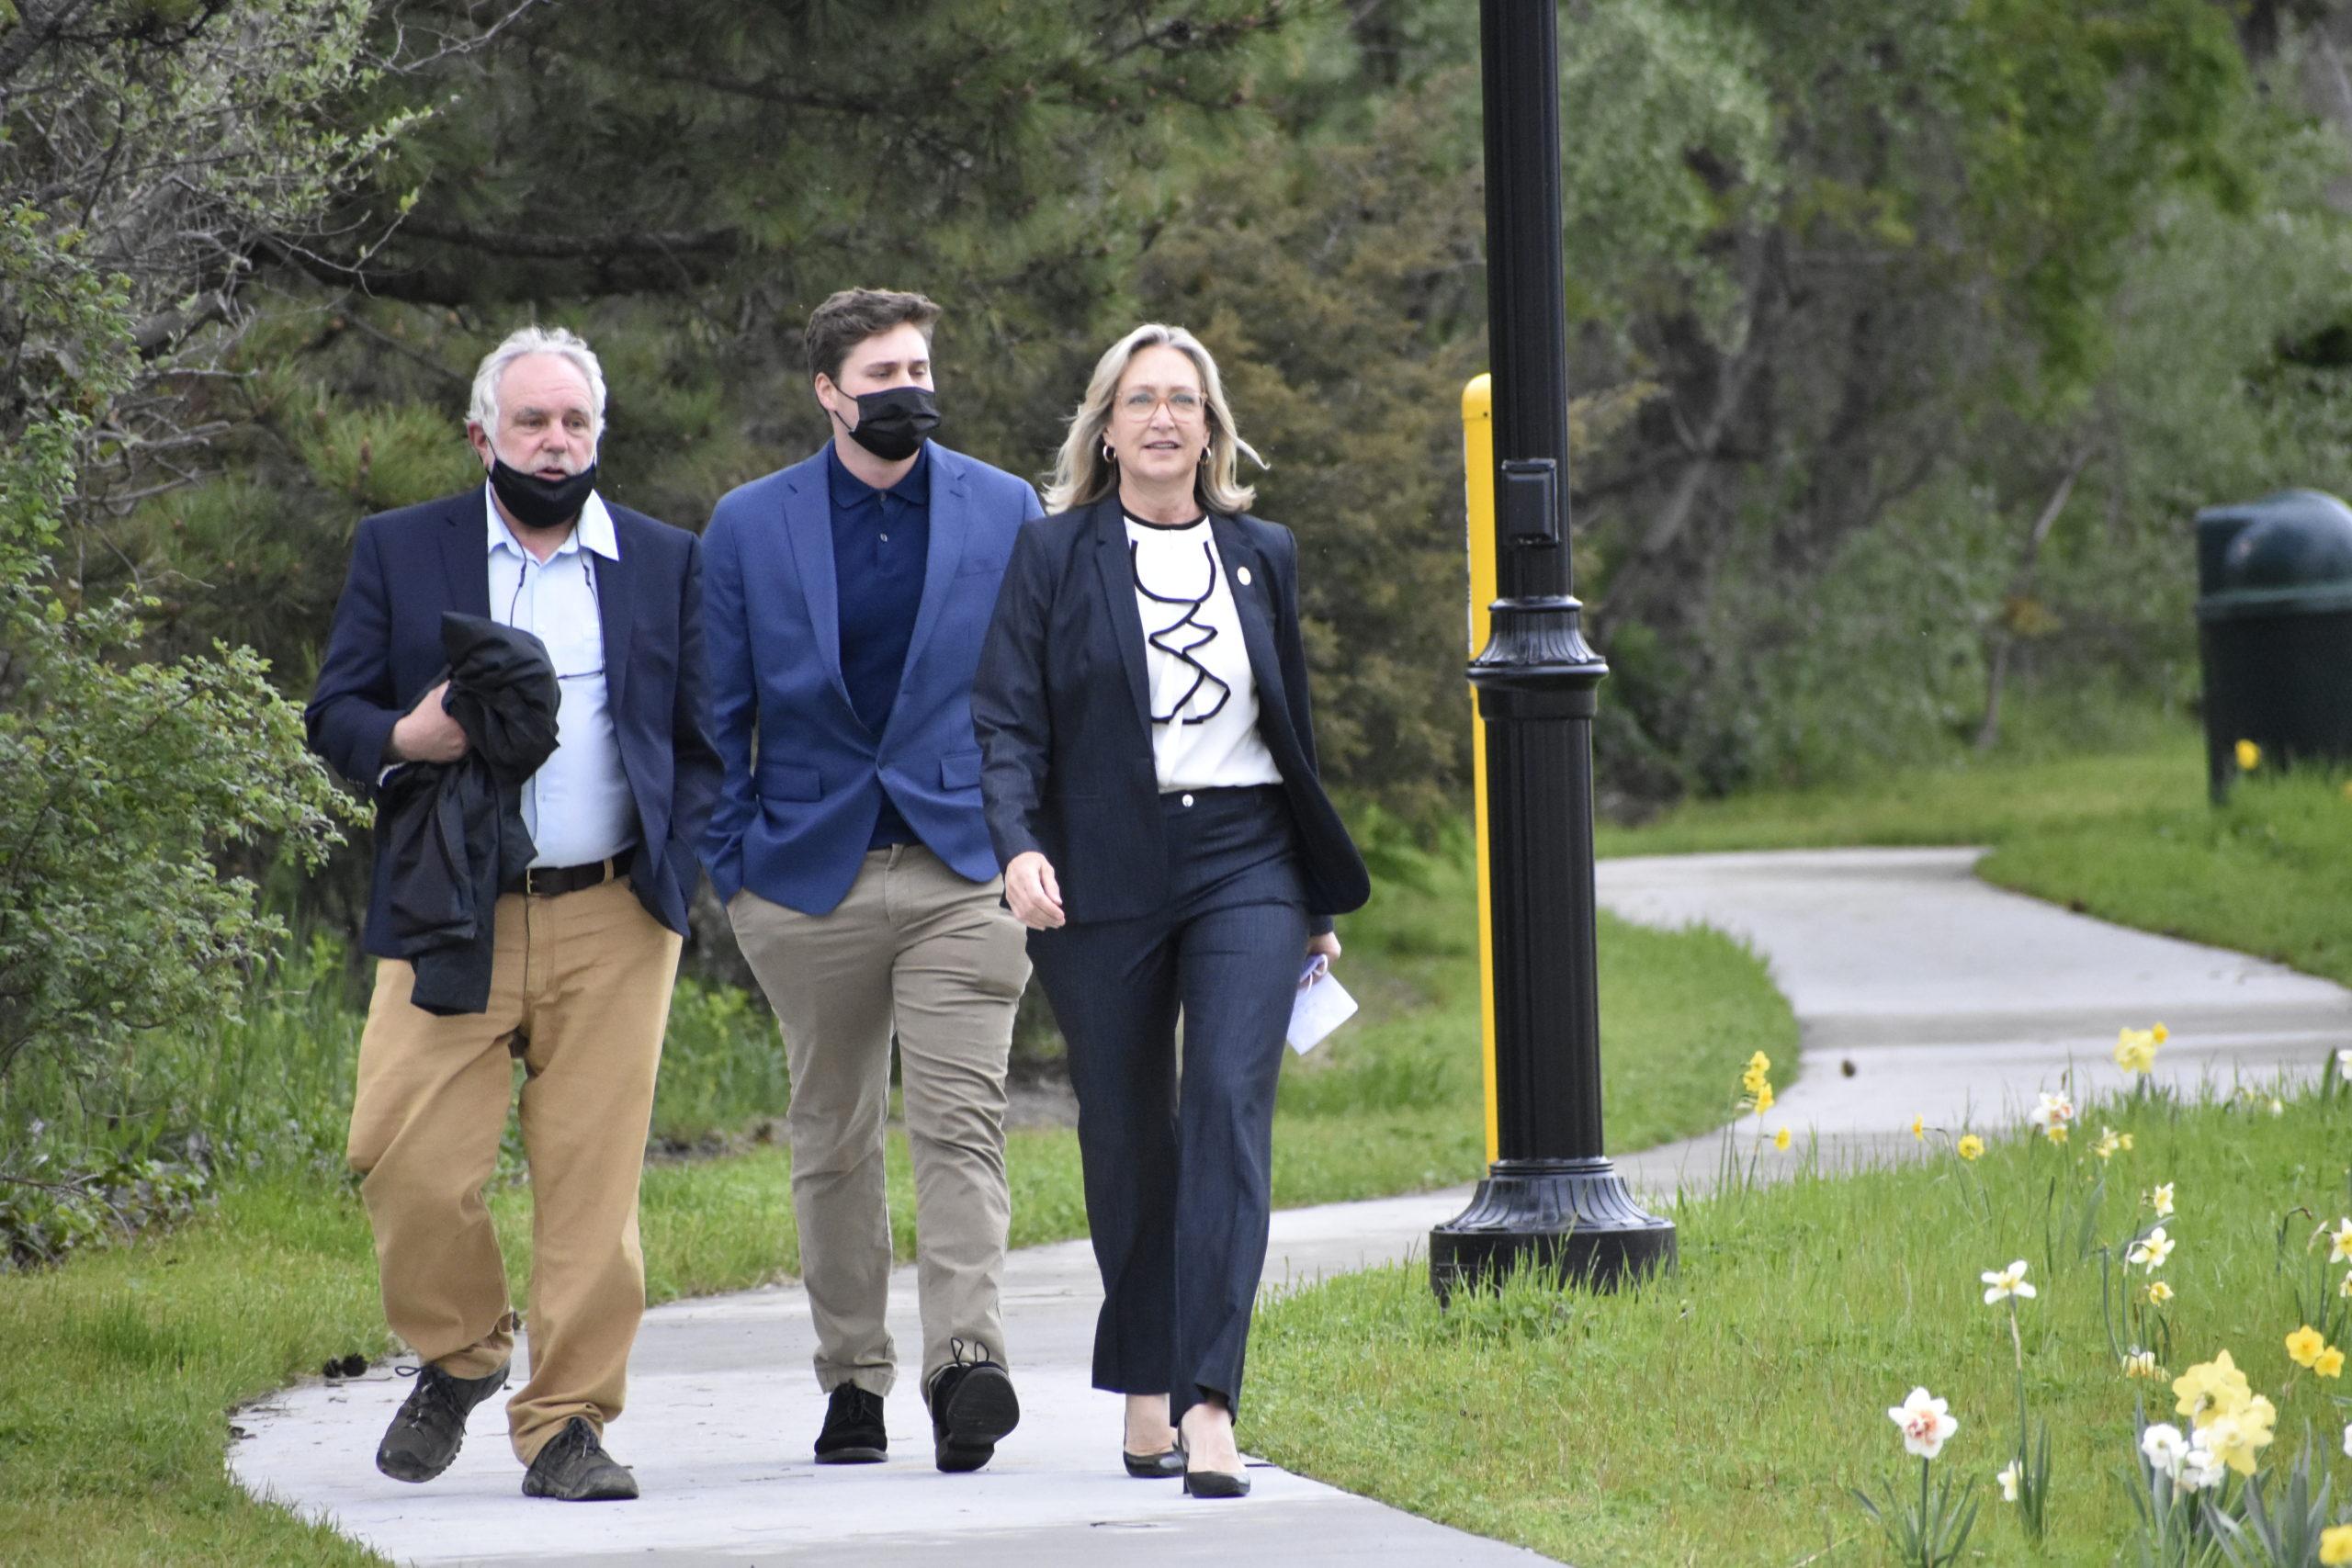 Bridget Fleming with her husband, Bob Agoglia, and son Jai Agoglia.